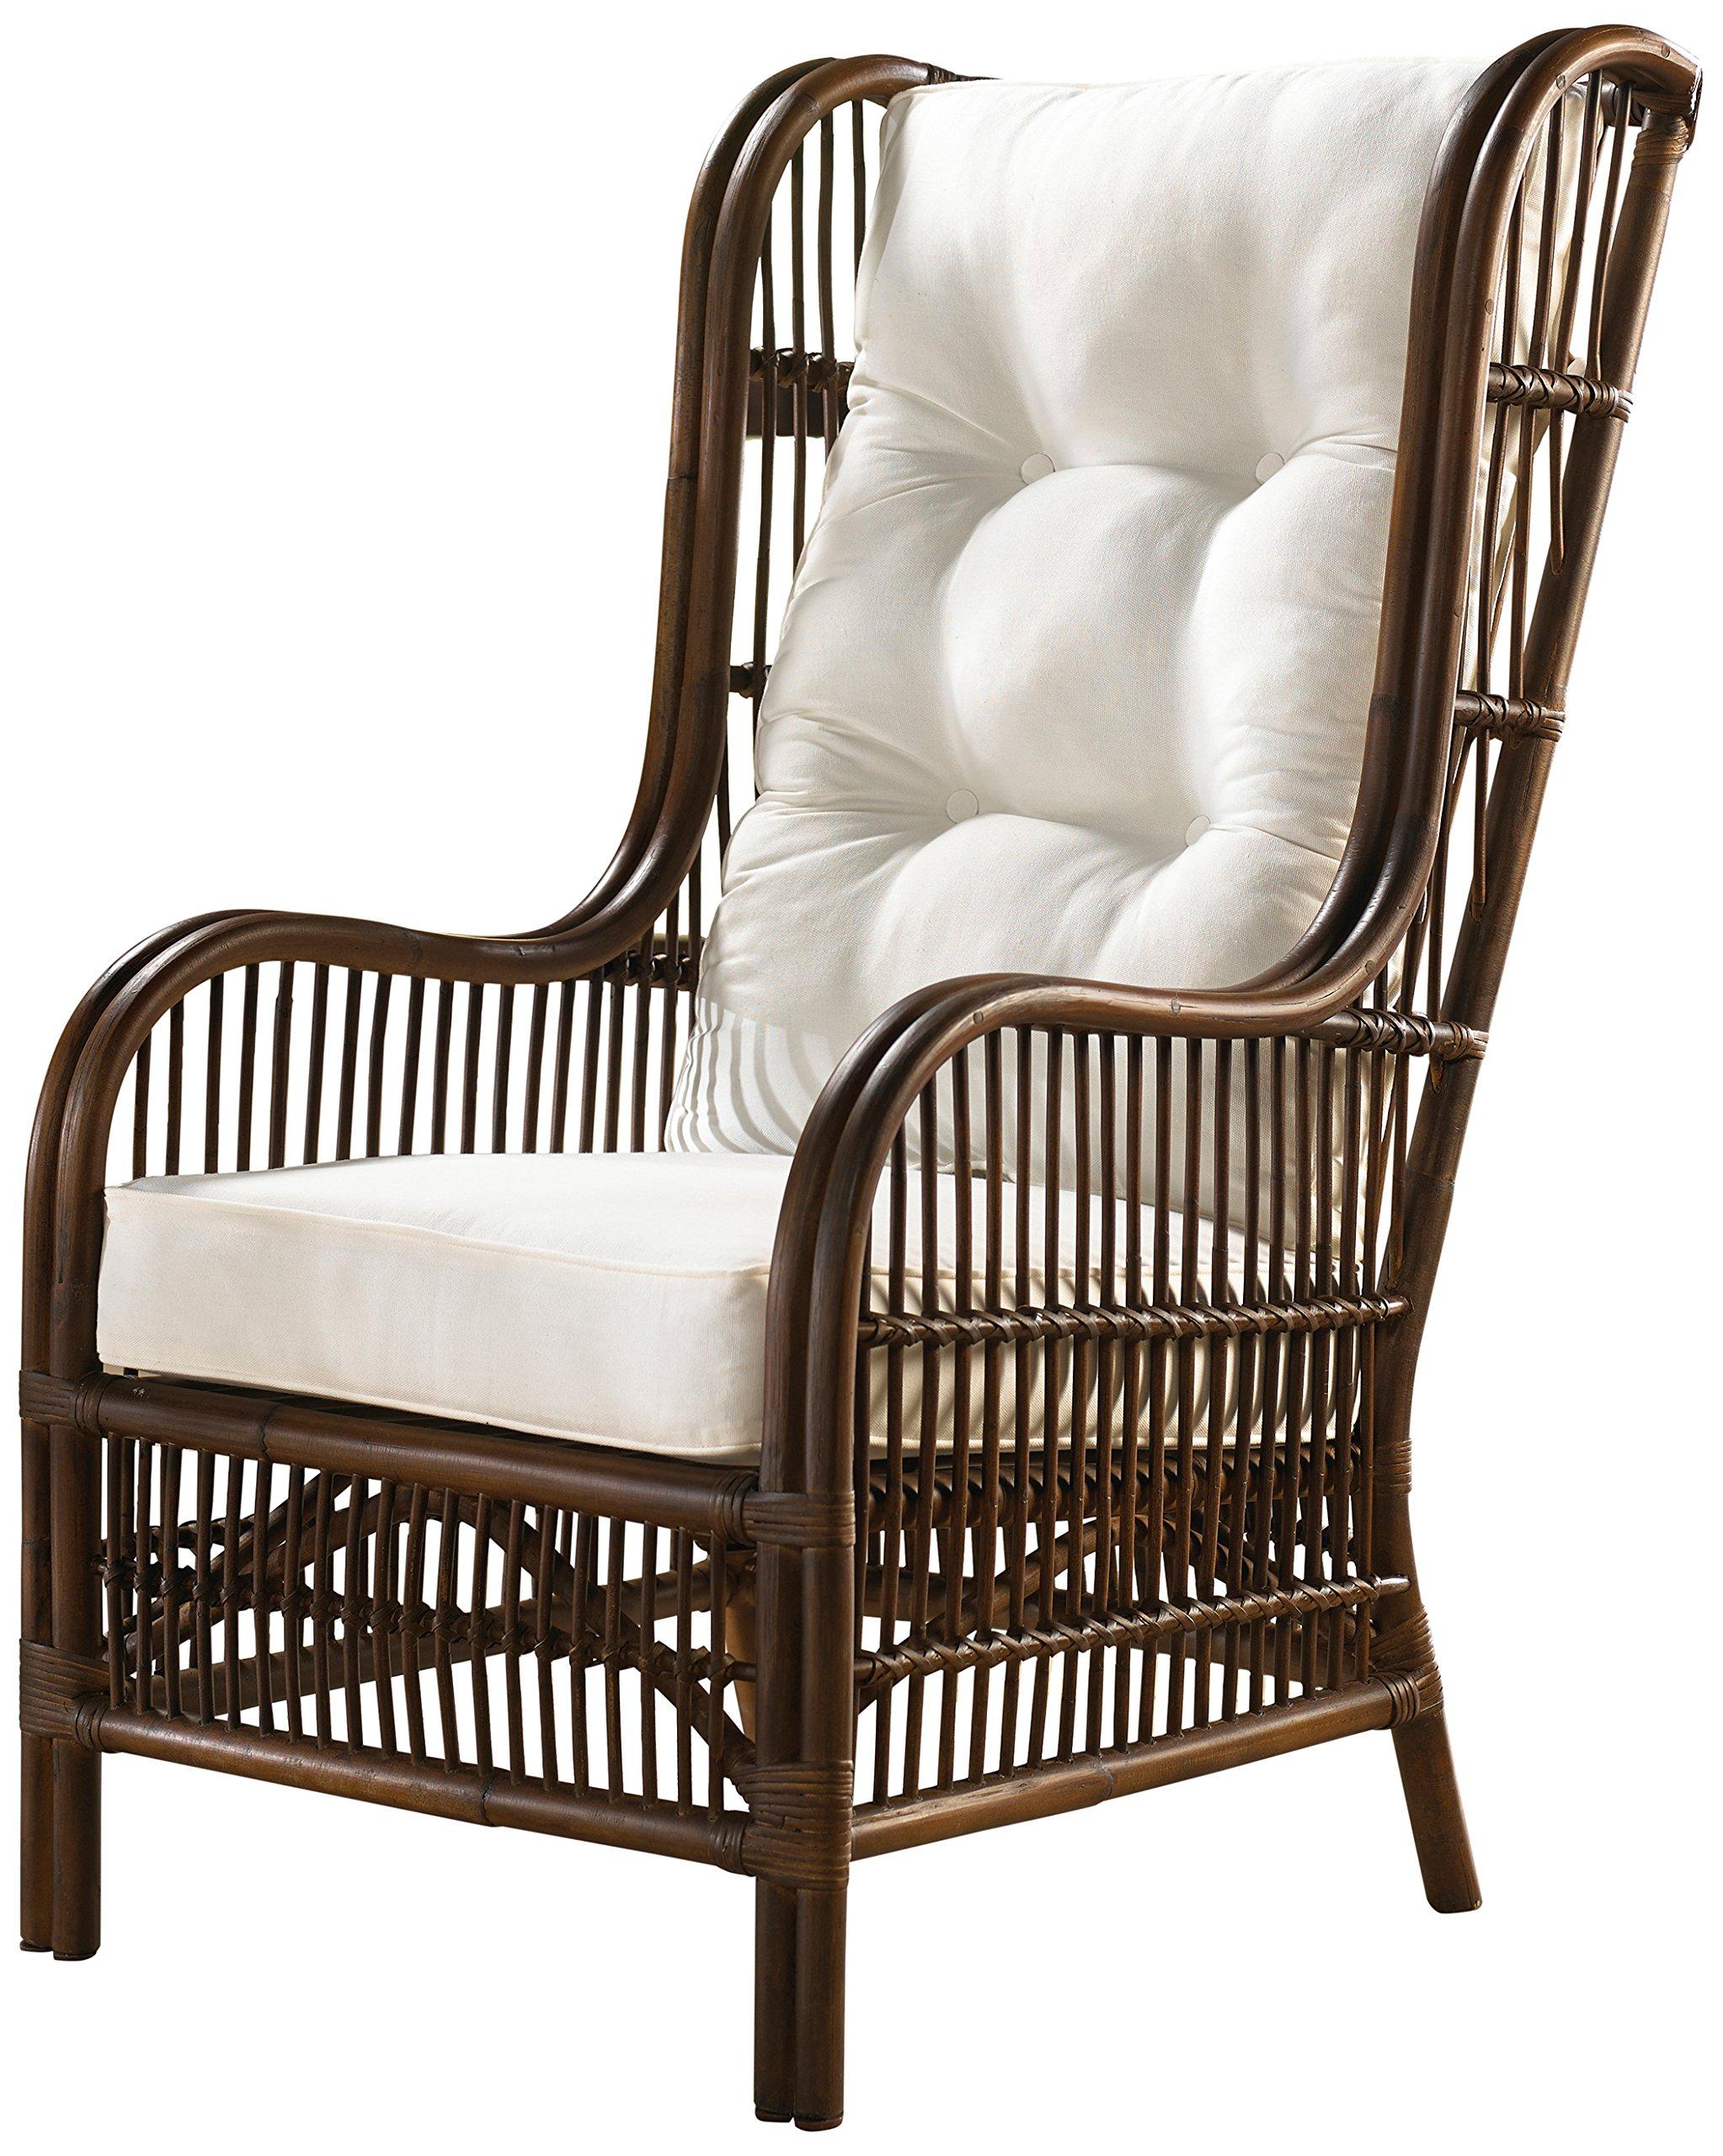 Panama Jack Sunrooms PJS-2001-ATQ-OC Bora Bora Occasional Chair with Cushion, Sunbrella Canvas Spa